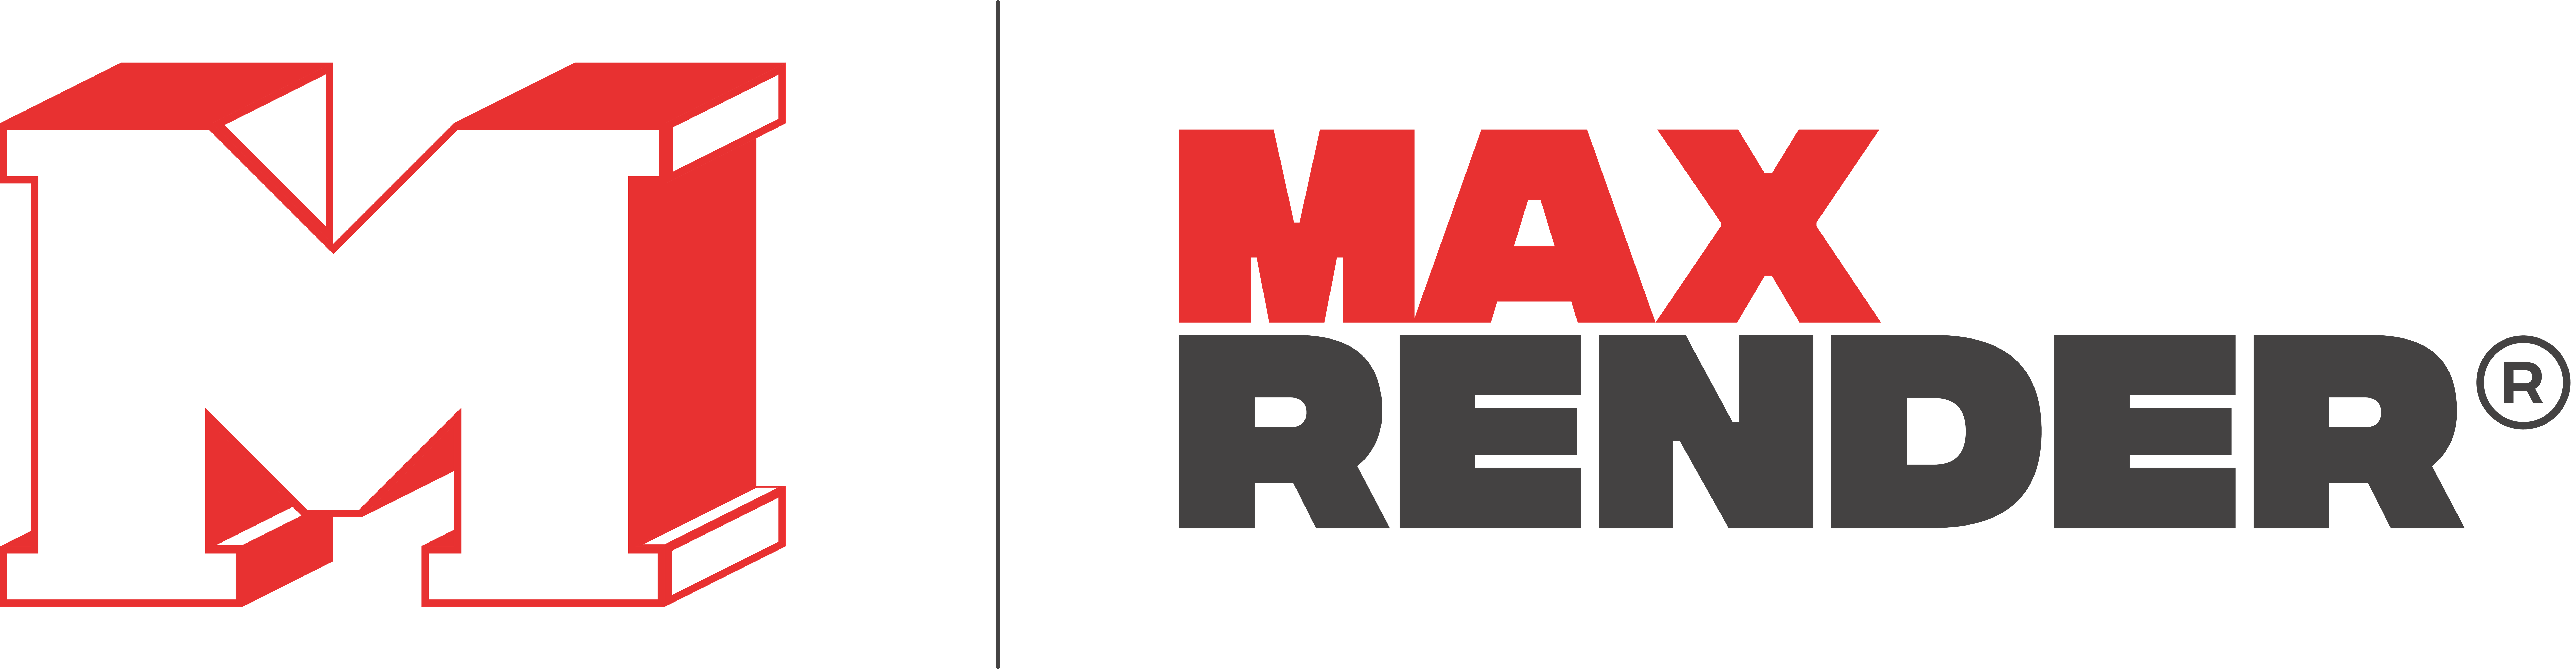 logomarca MaxRender